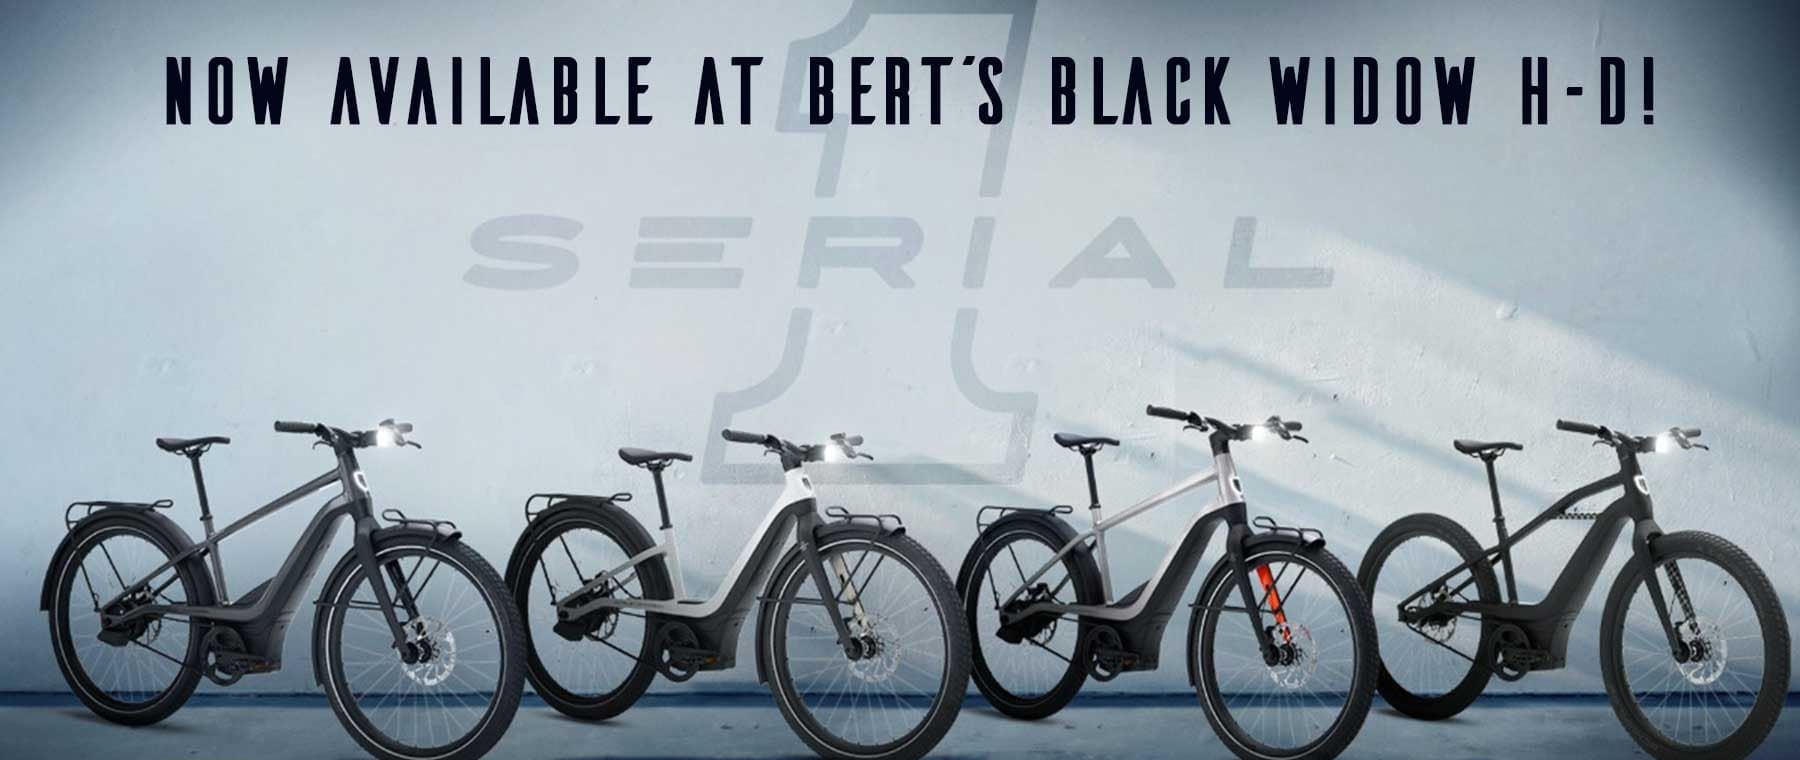 BERTS-HD_062921_Serial1-web